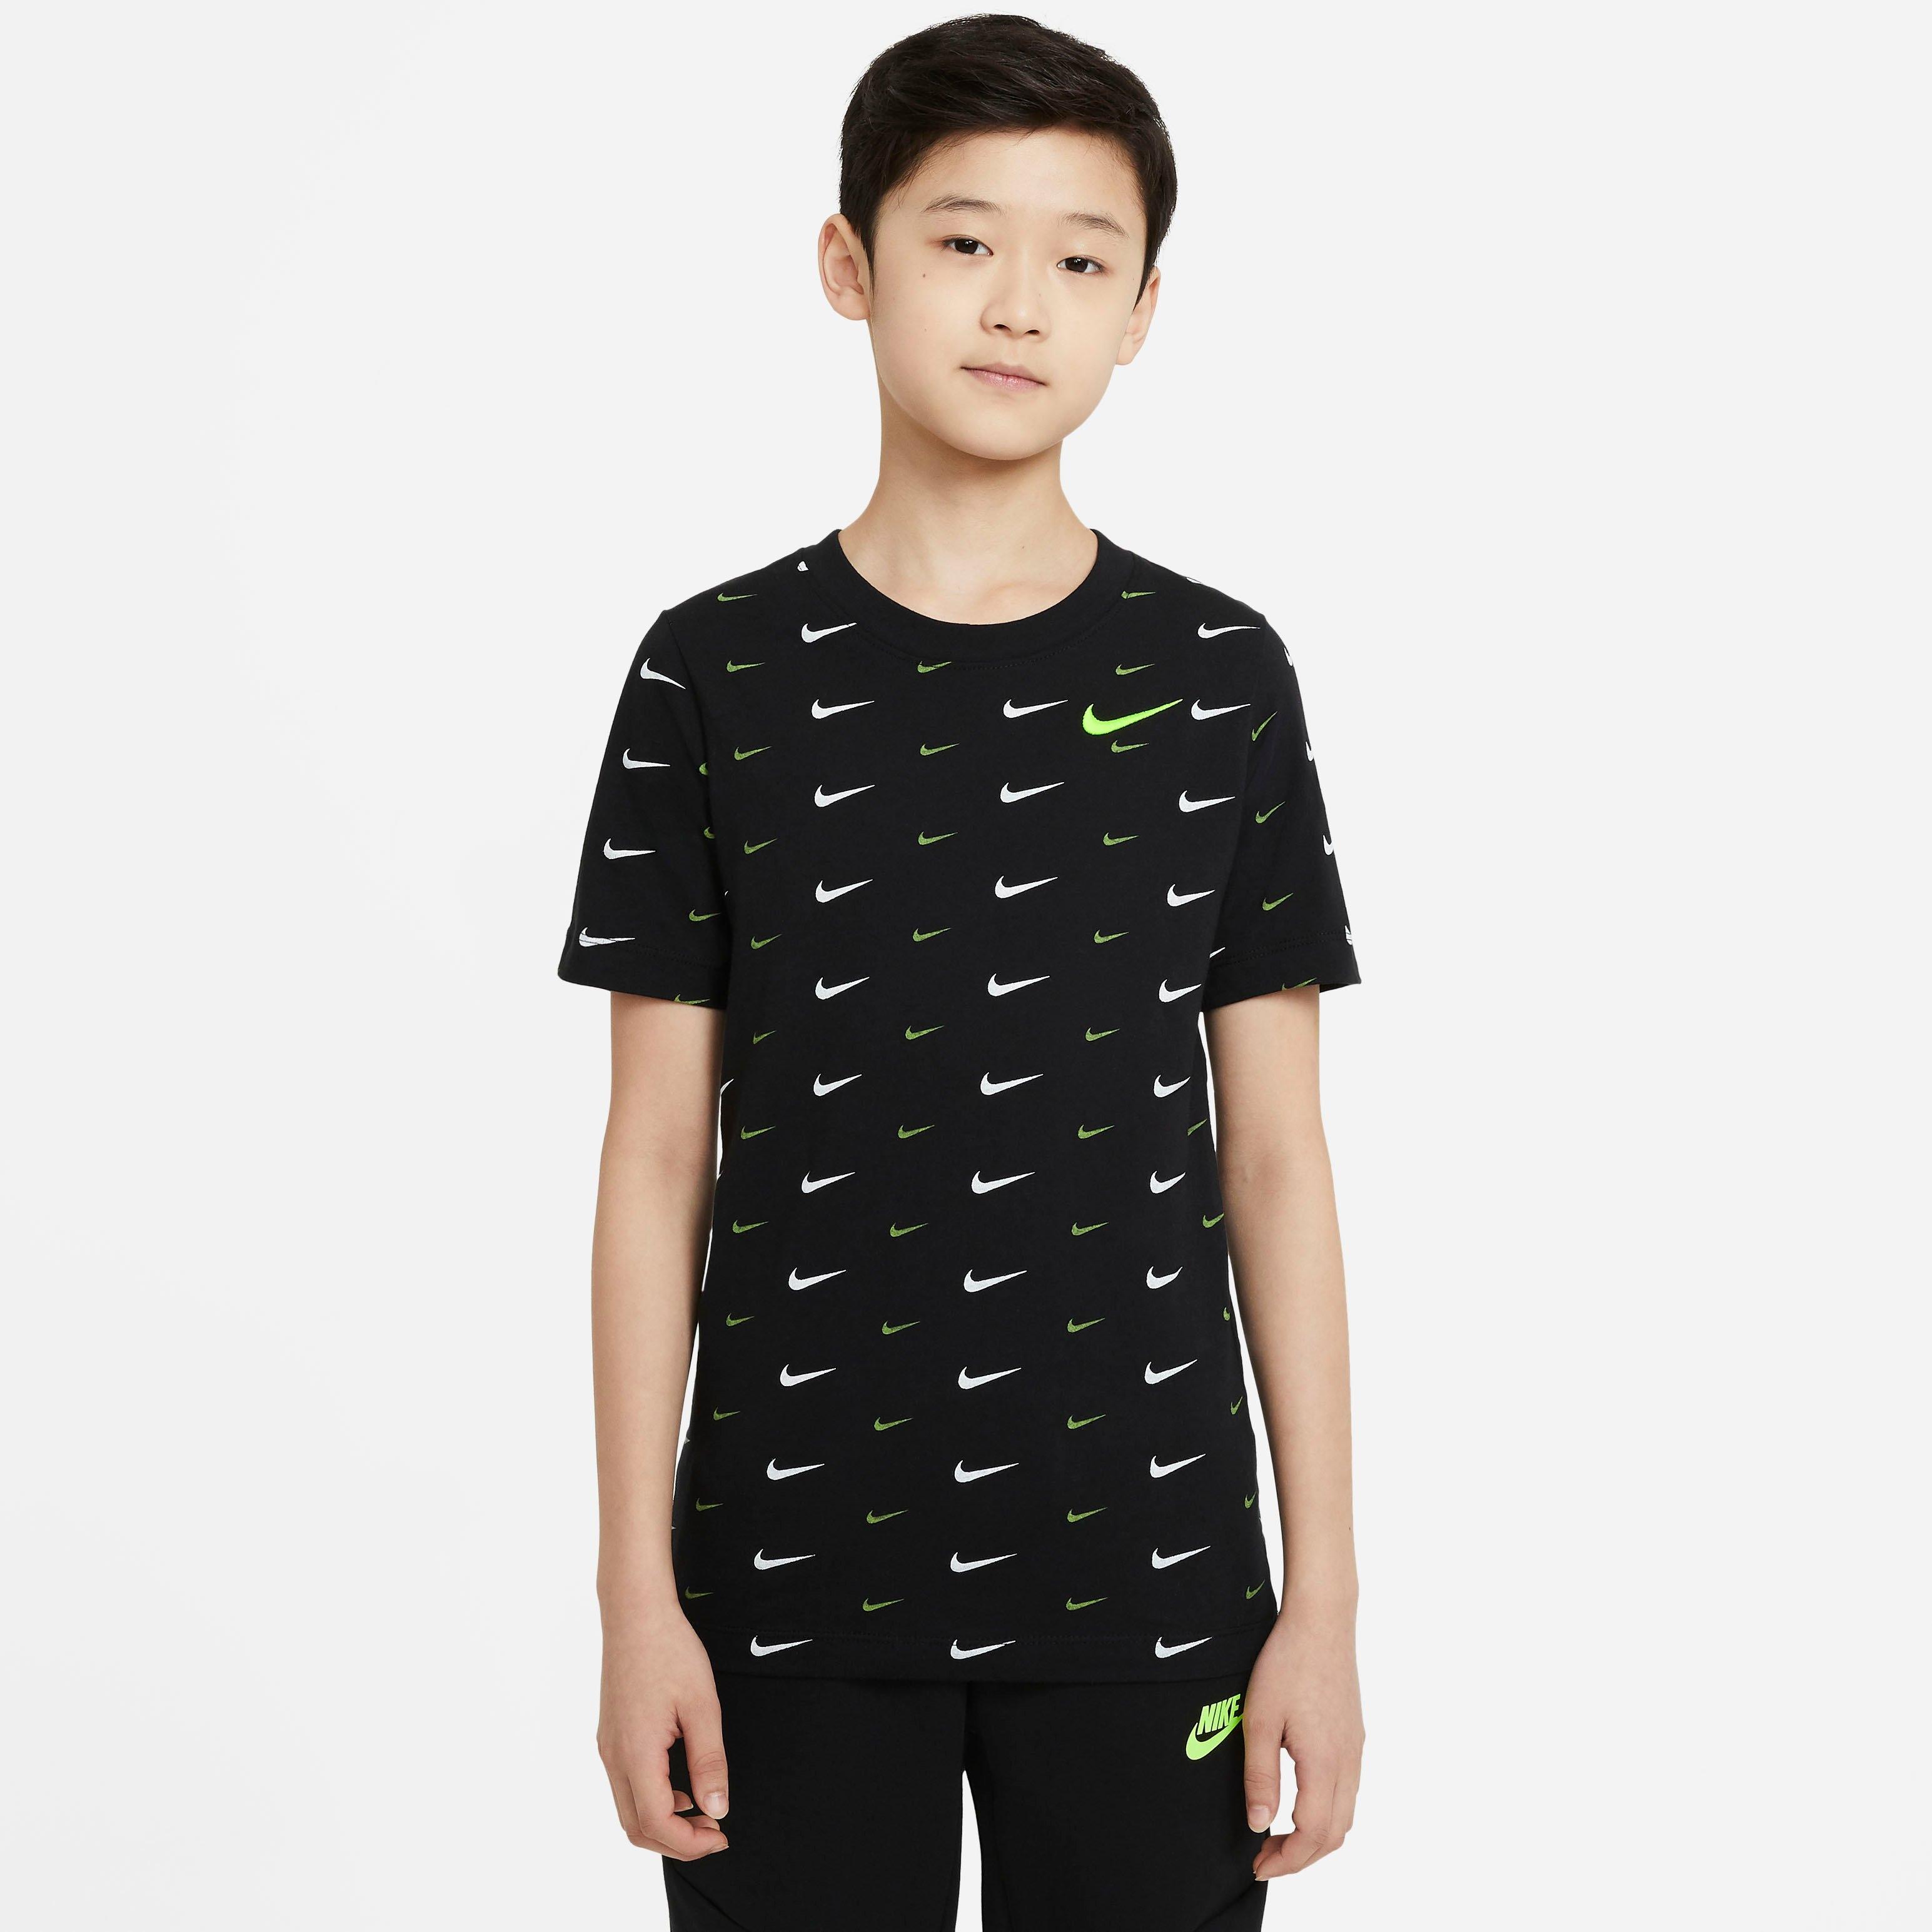 Nike Sportswear T-shirt voordelig en veilig online kopen